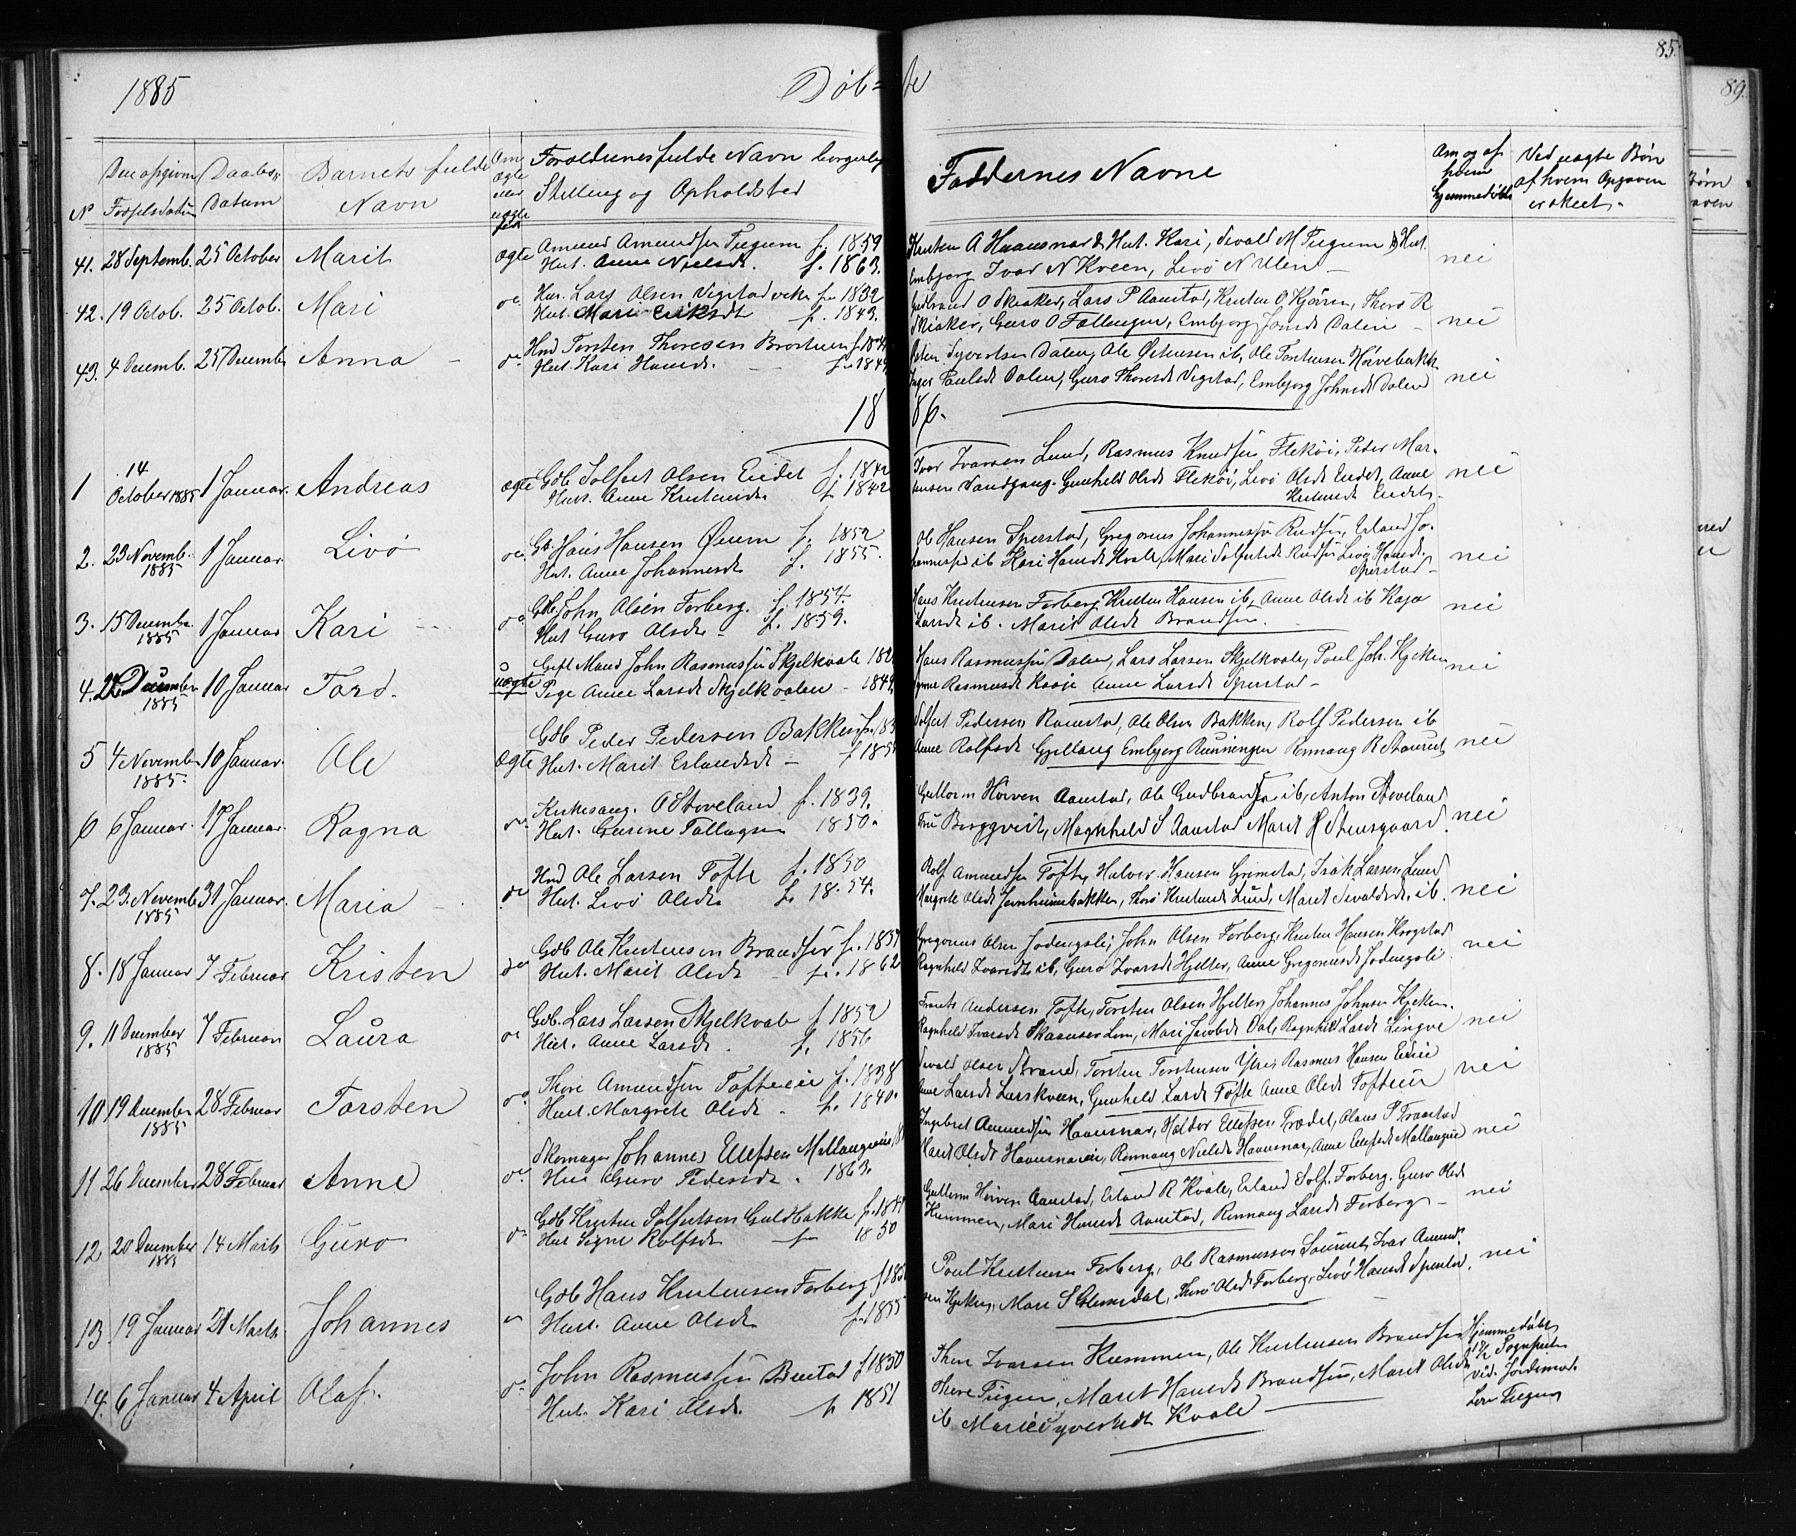 SAH, Skjåk prestekontor, Klokkerbok nr. 1, 1865-1893, s. 85